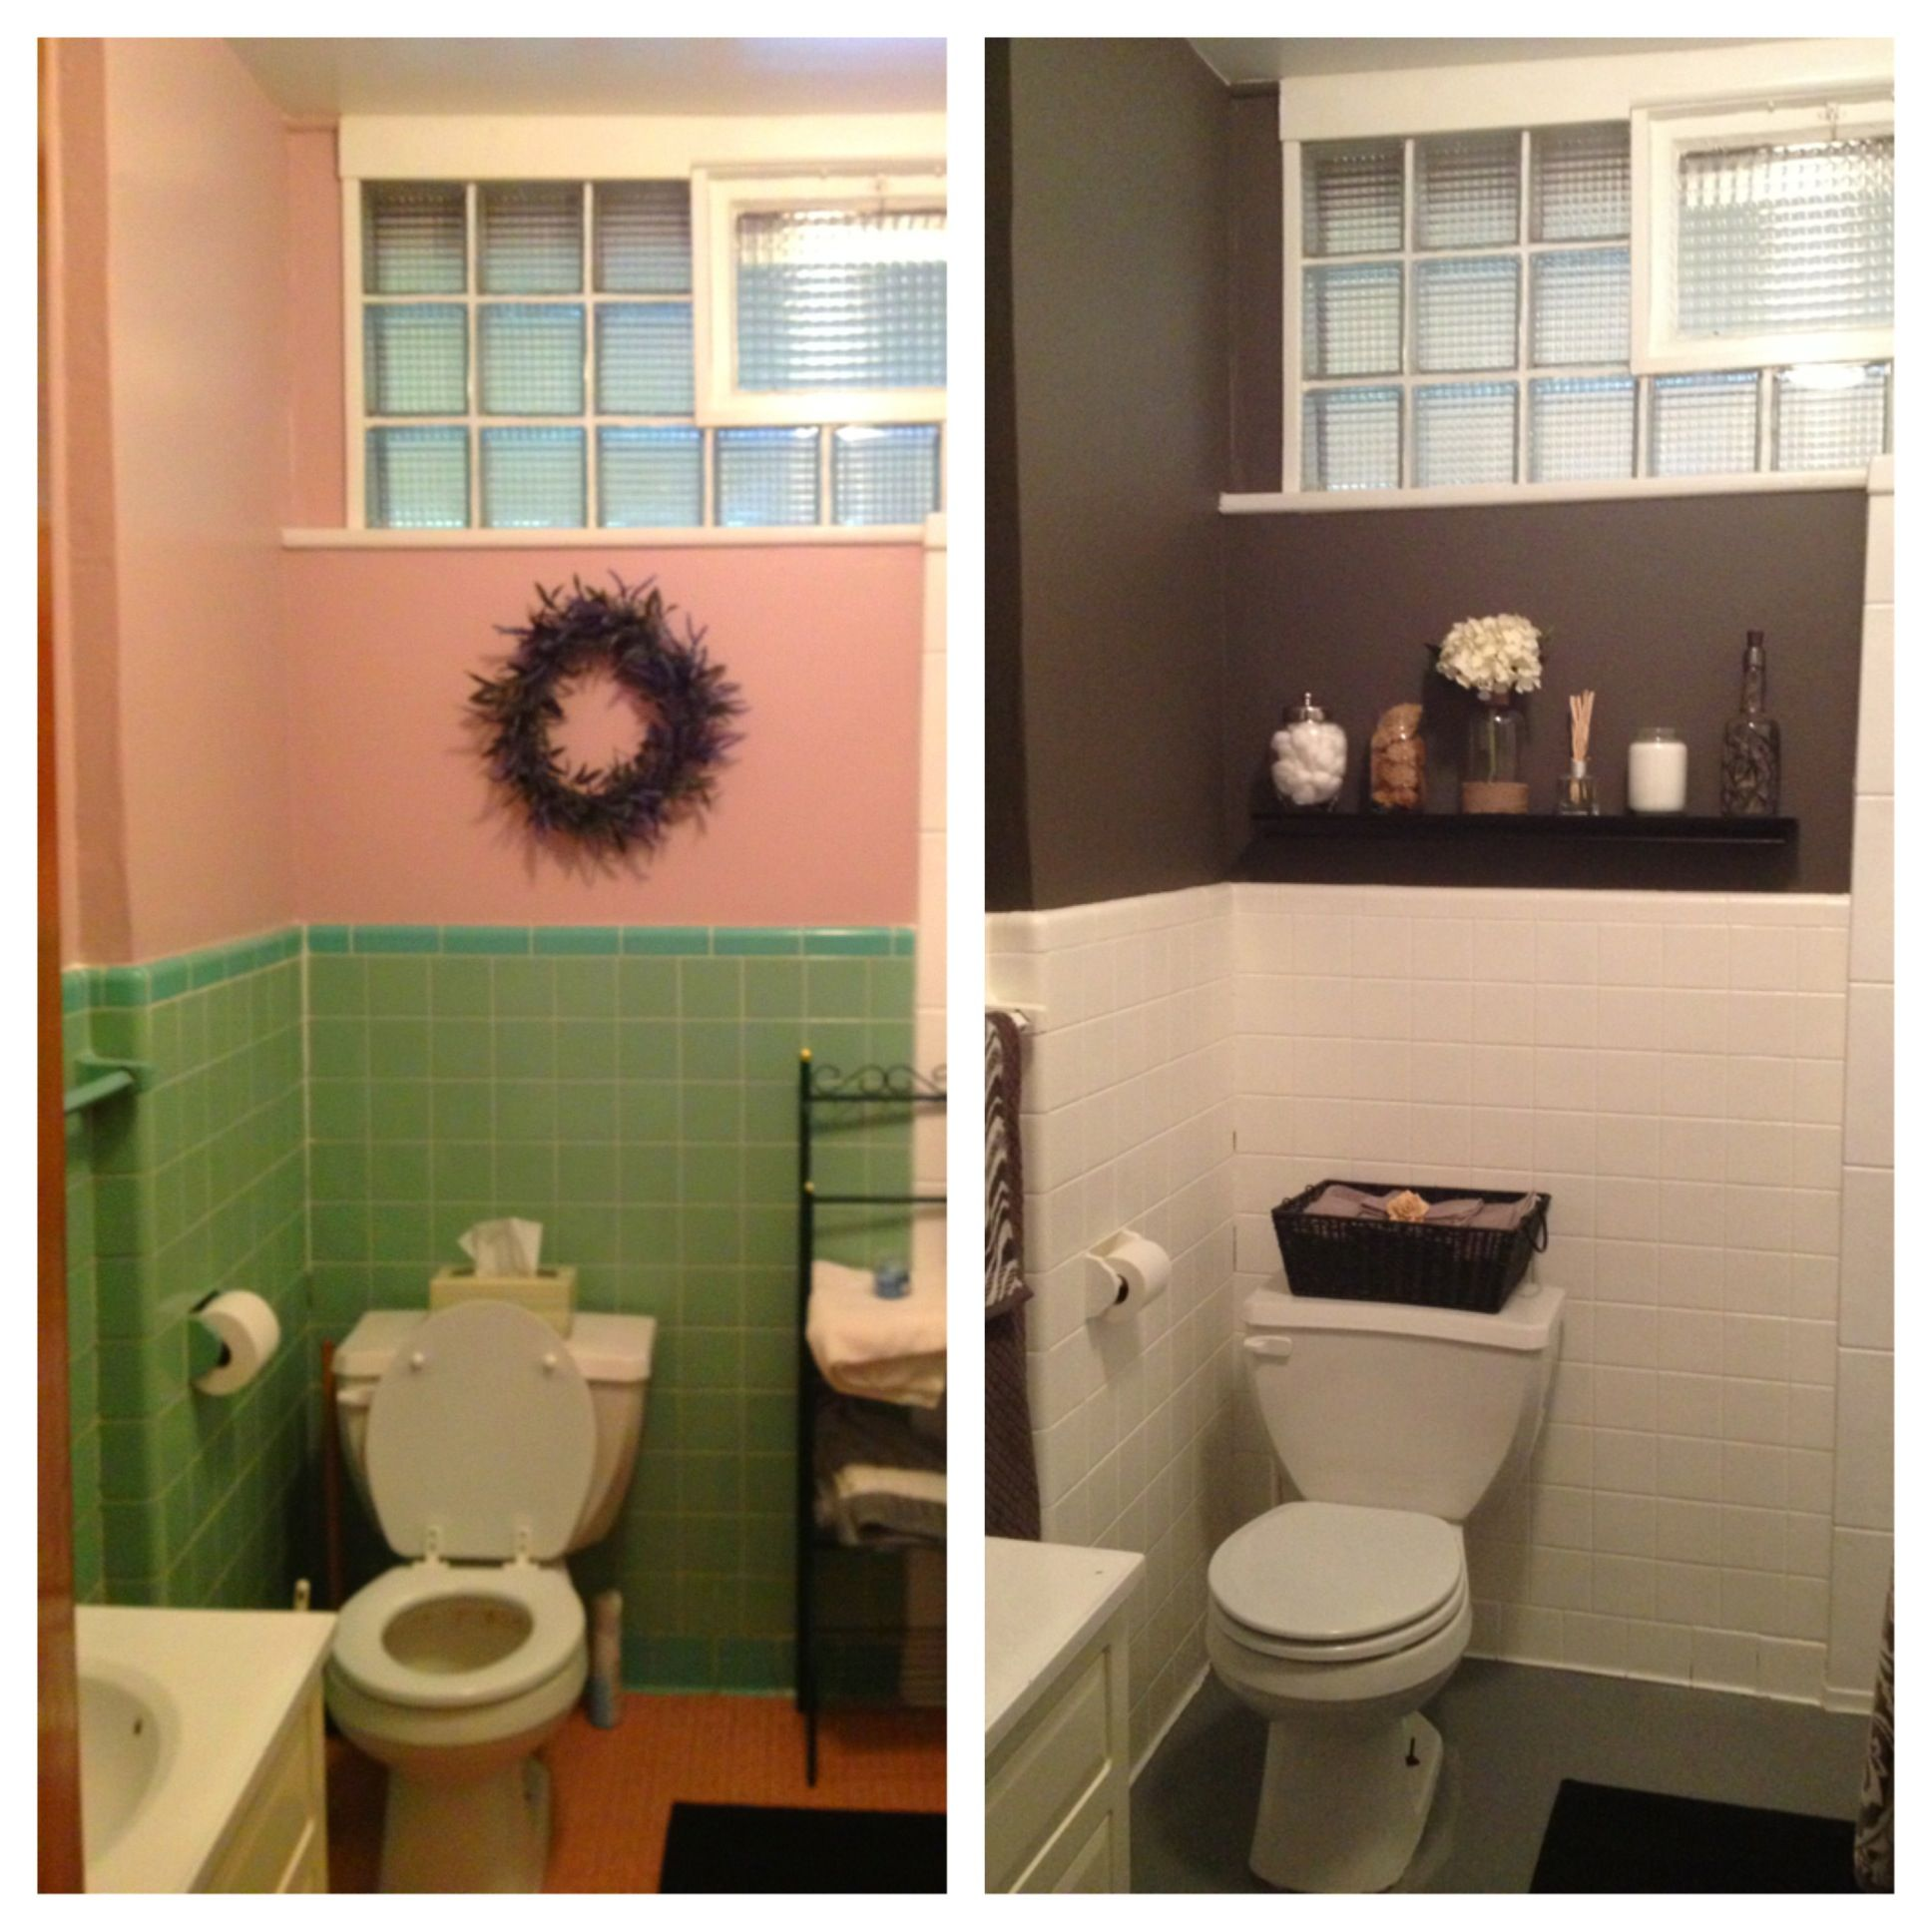 Pin By Drea Goebel On My Own Diy Bathroom Remodel Diy Bathroom